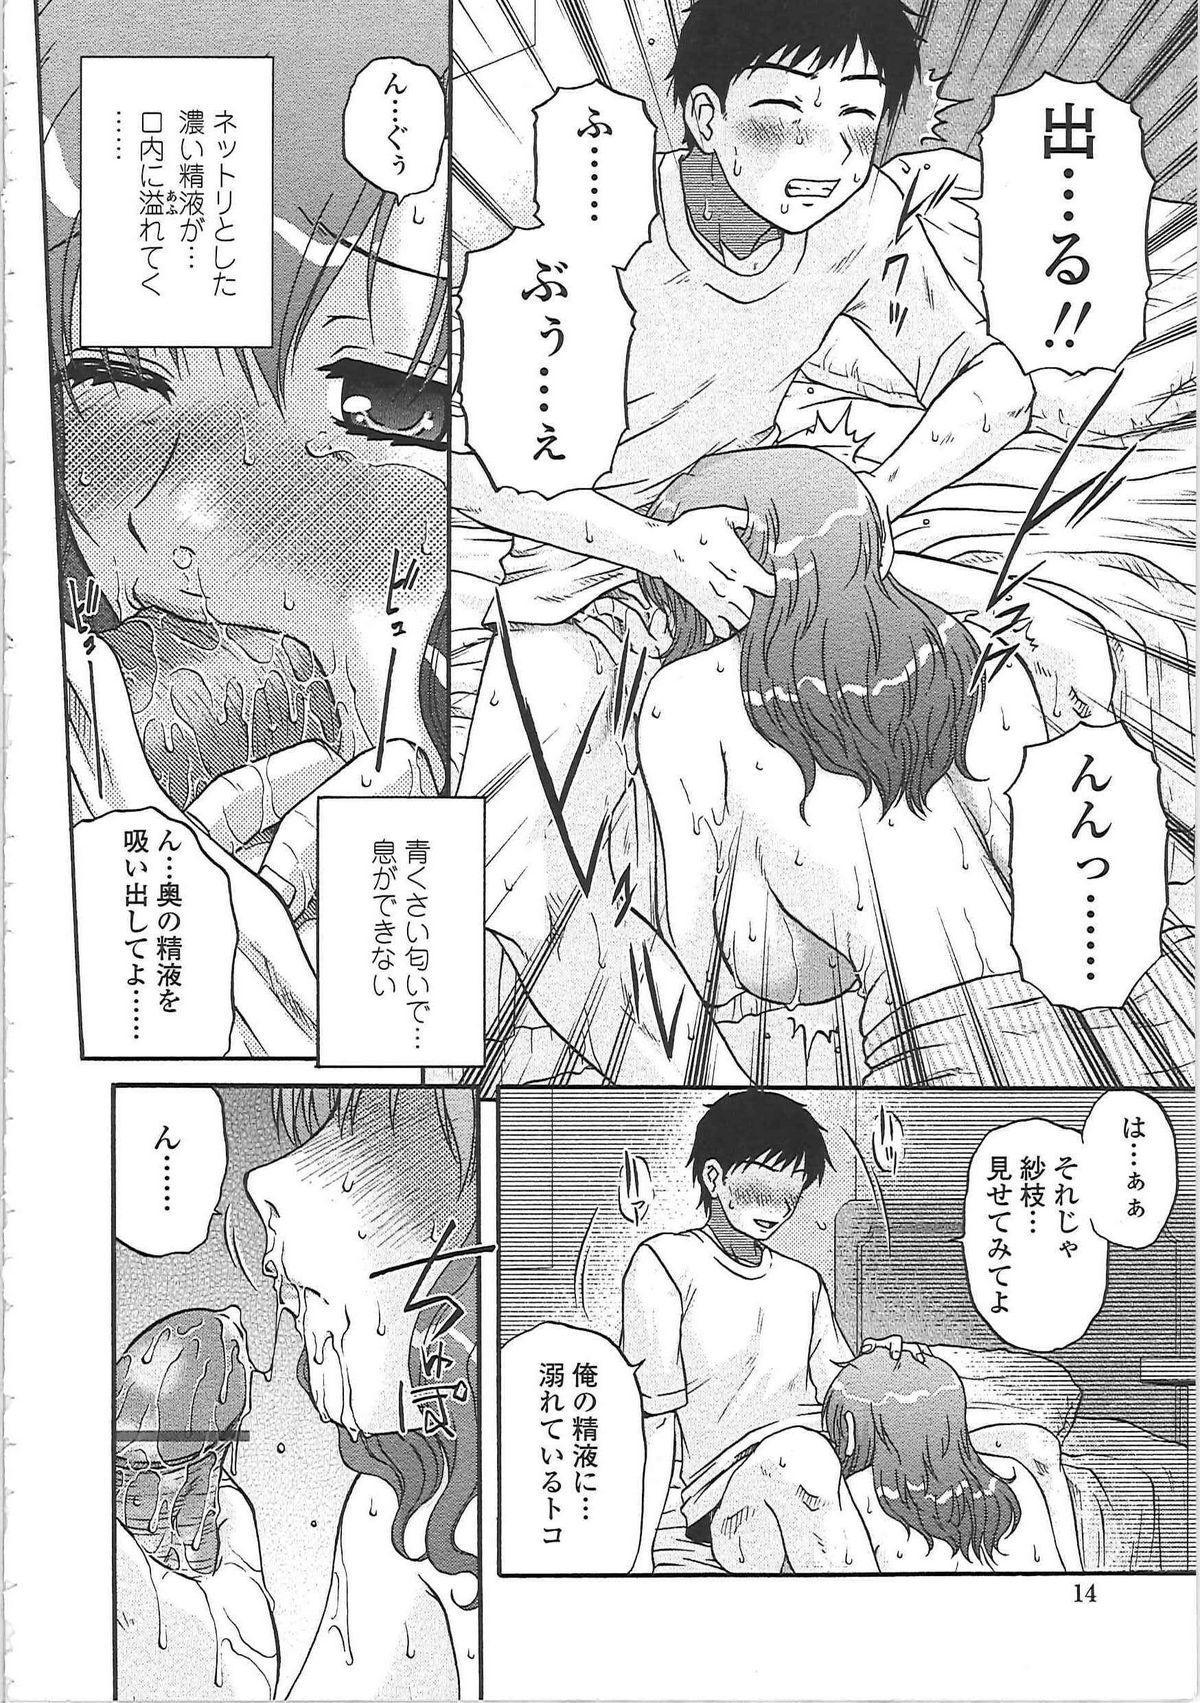 Nikuzuma Tsuushin - Erotic Wife Communication 18